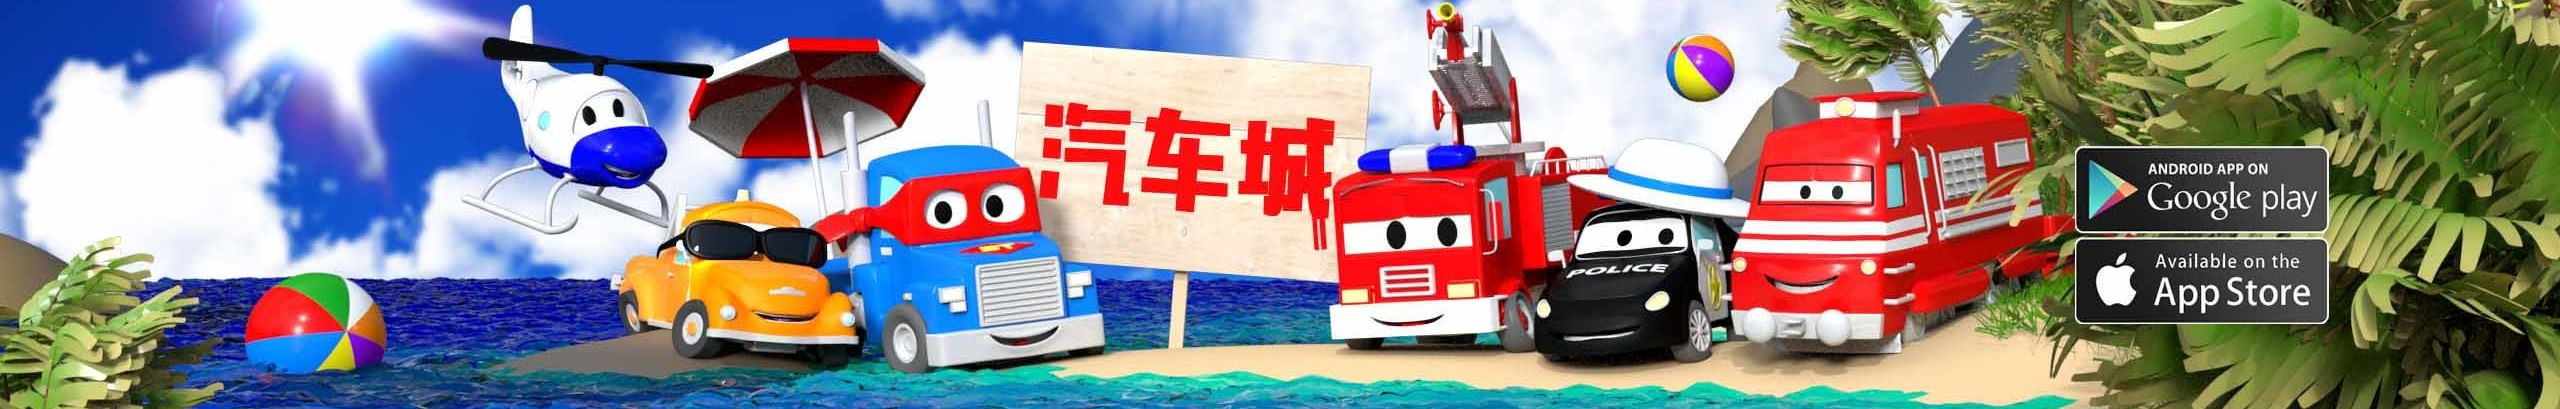 汽车城儿童工程卡通 banner